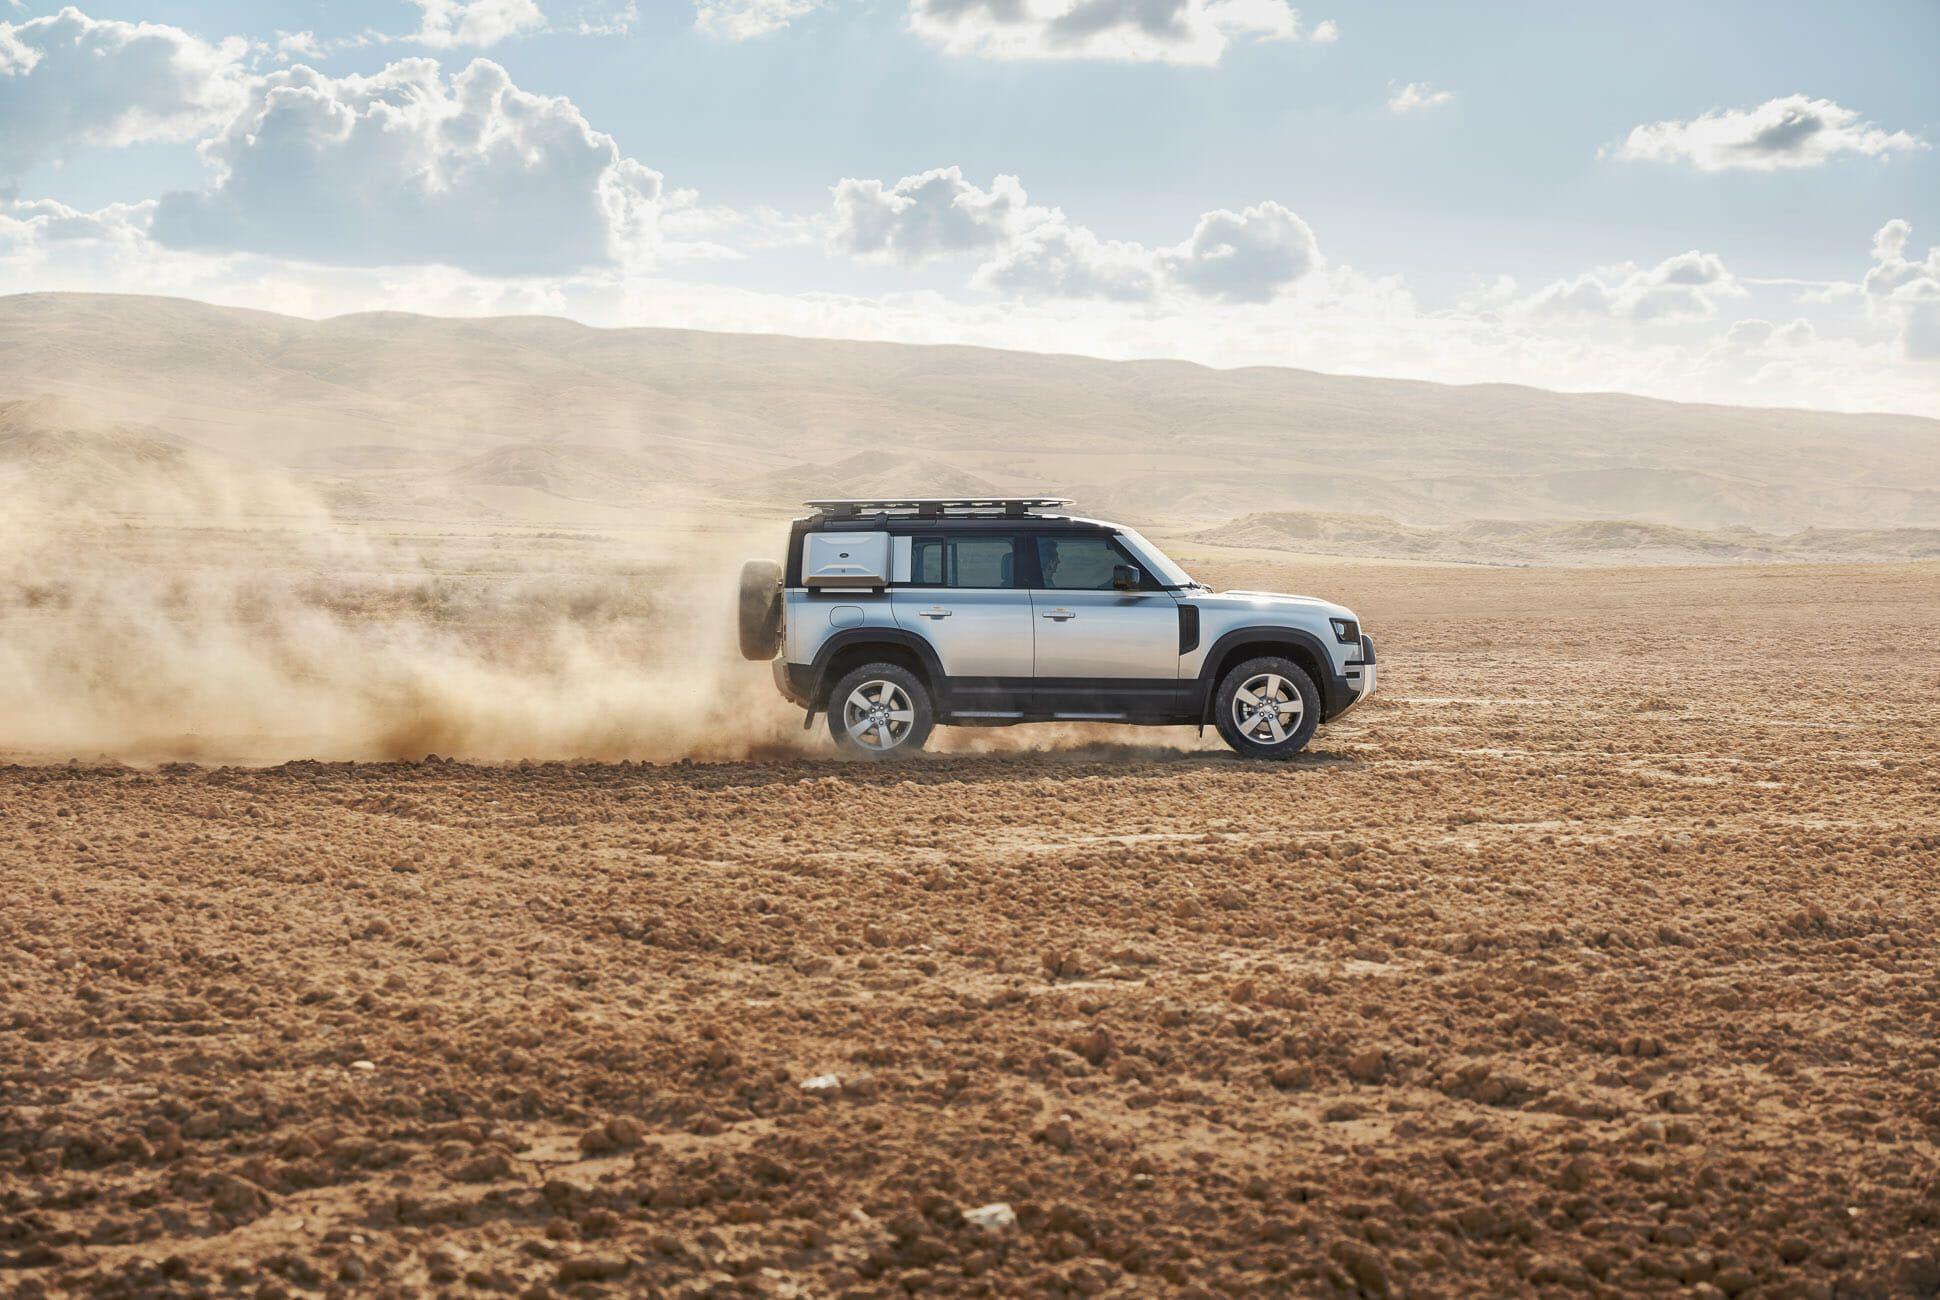 Land Rover Defender Gear Patrol-Exterior Action-Slide-24